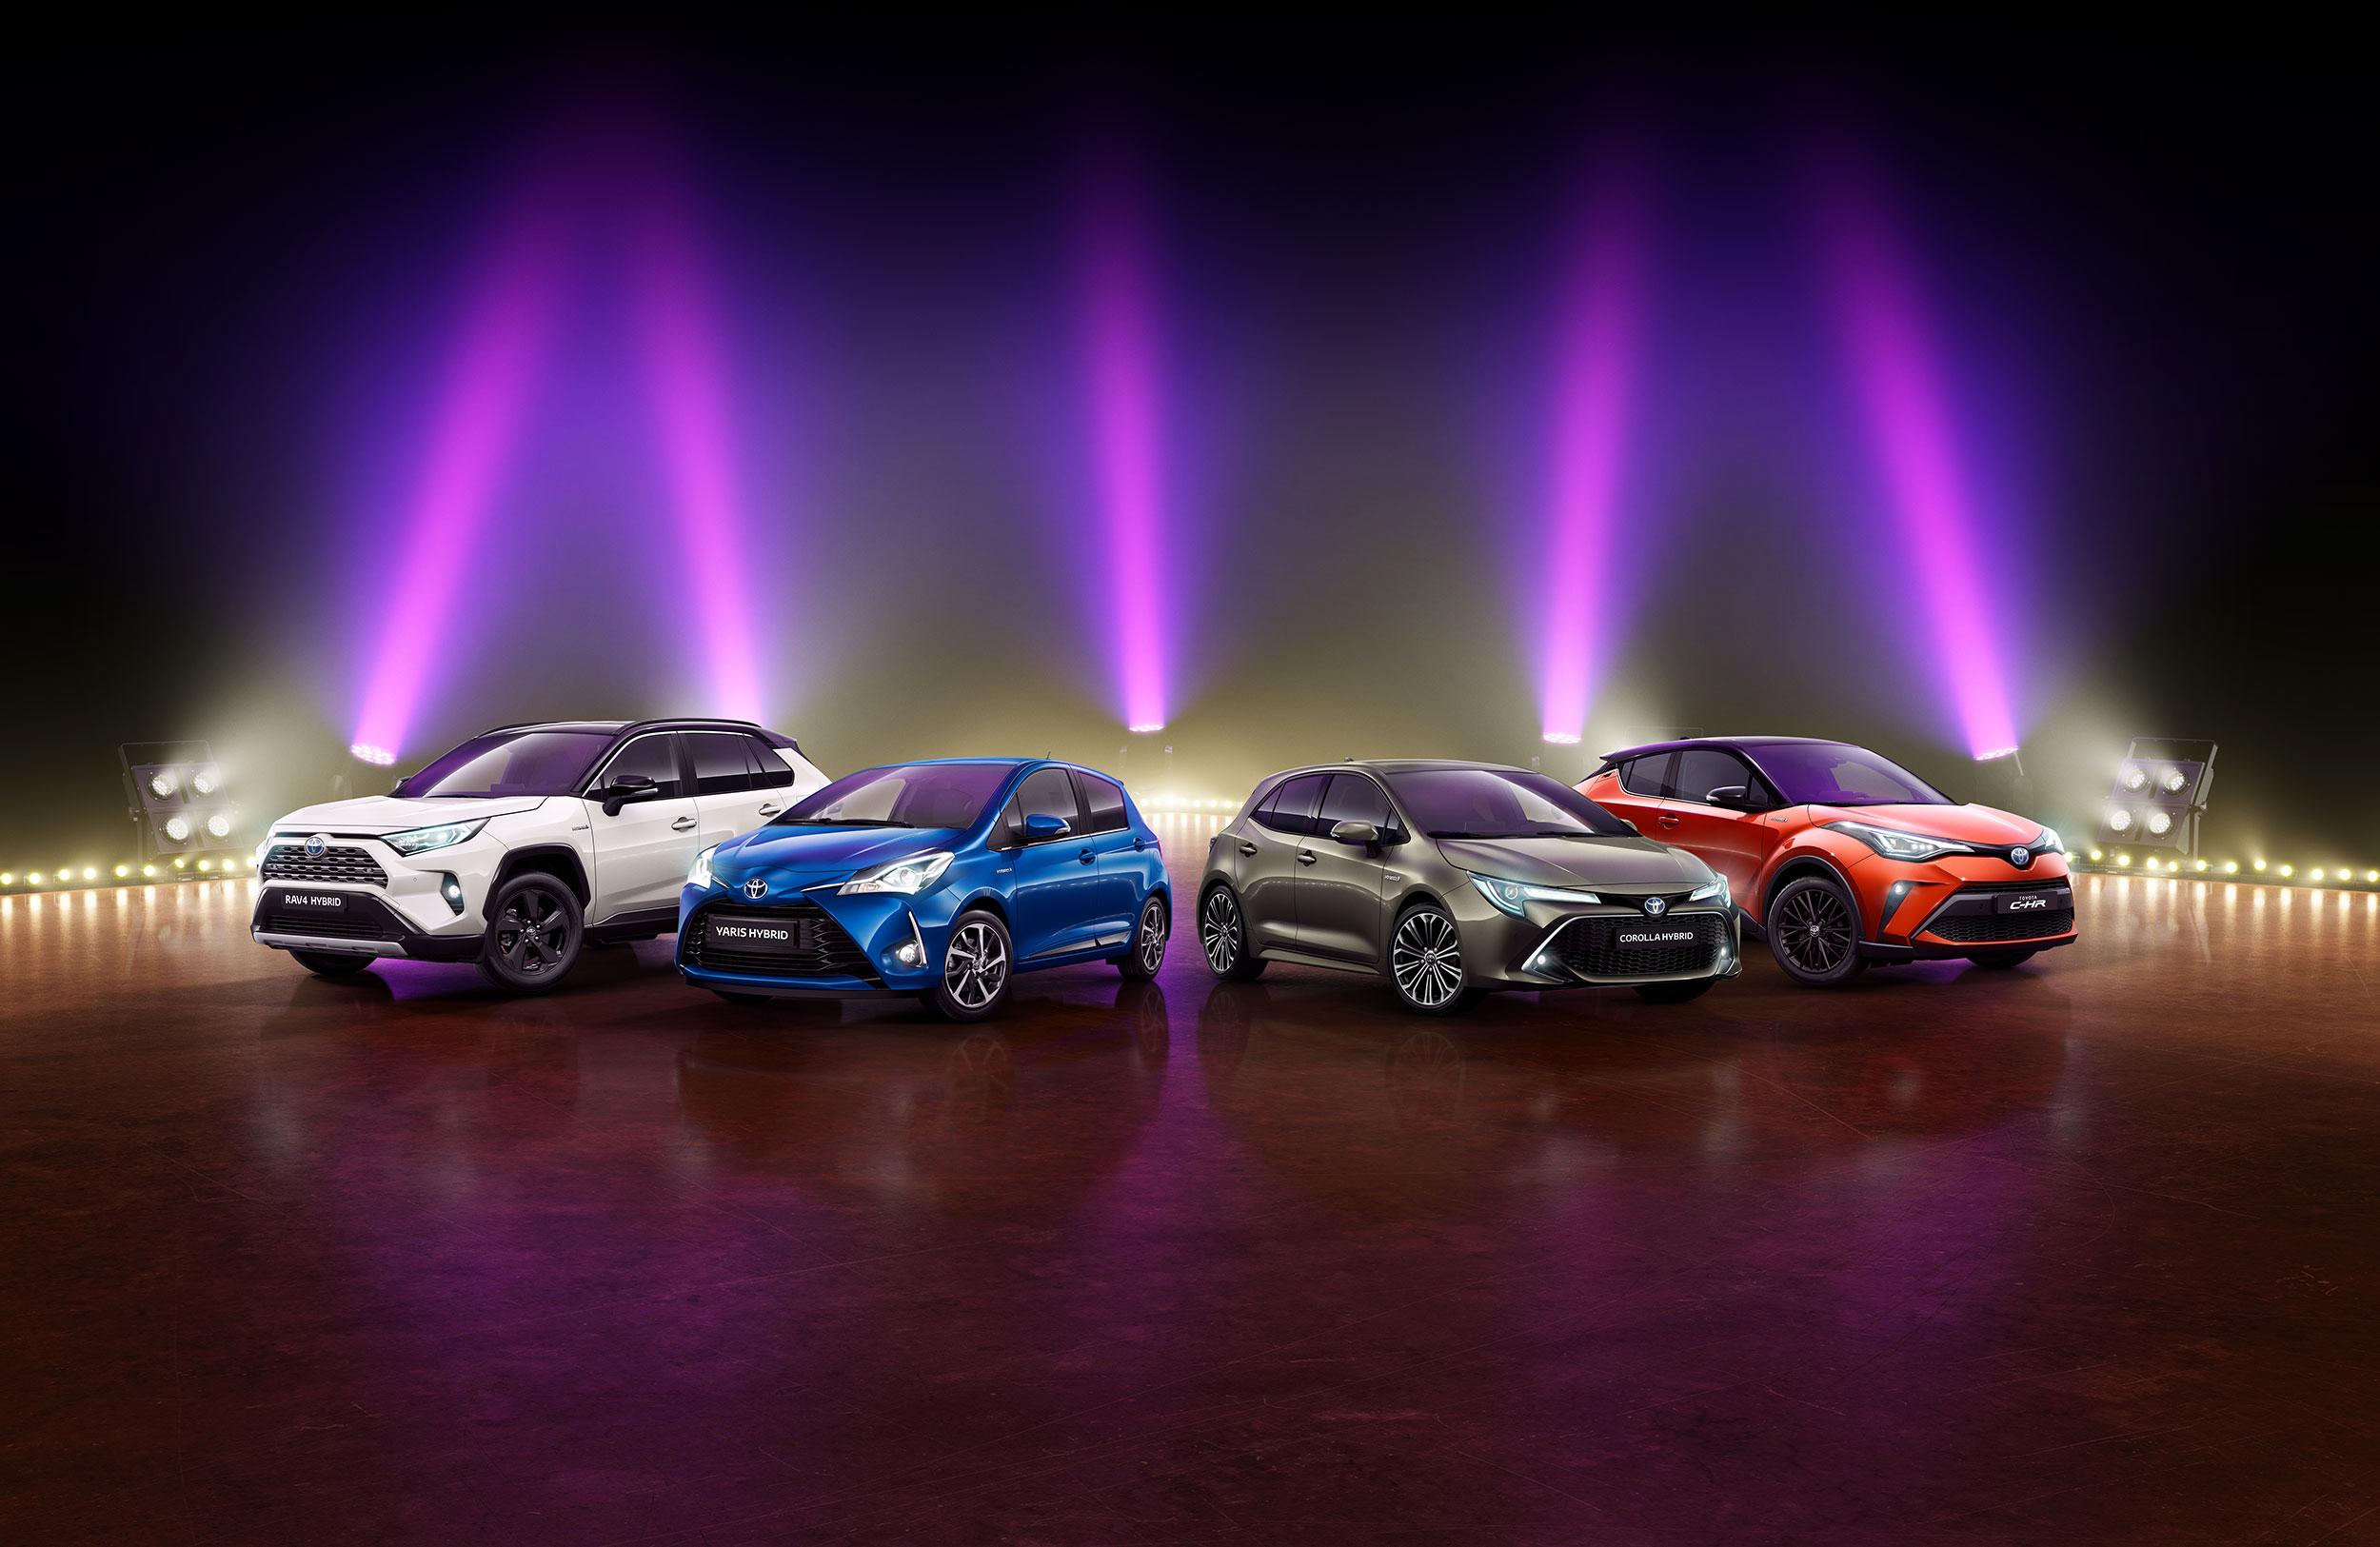 Blaupapier Retusche Cgi Toyota Testival Range